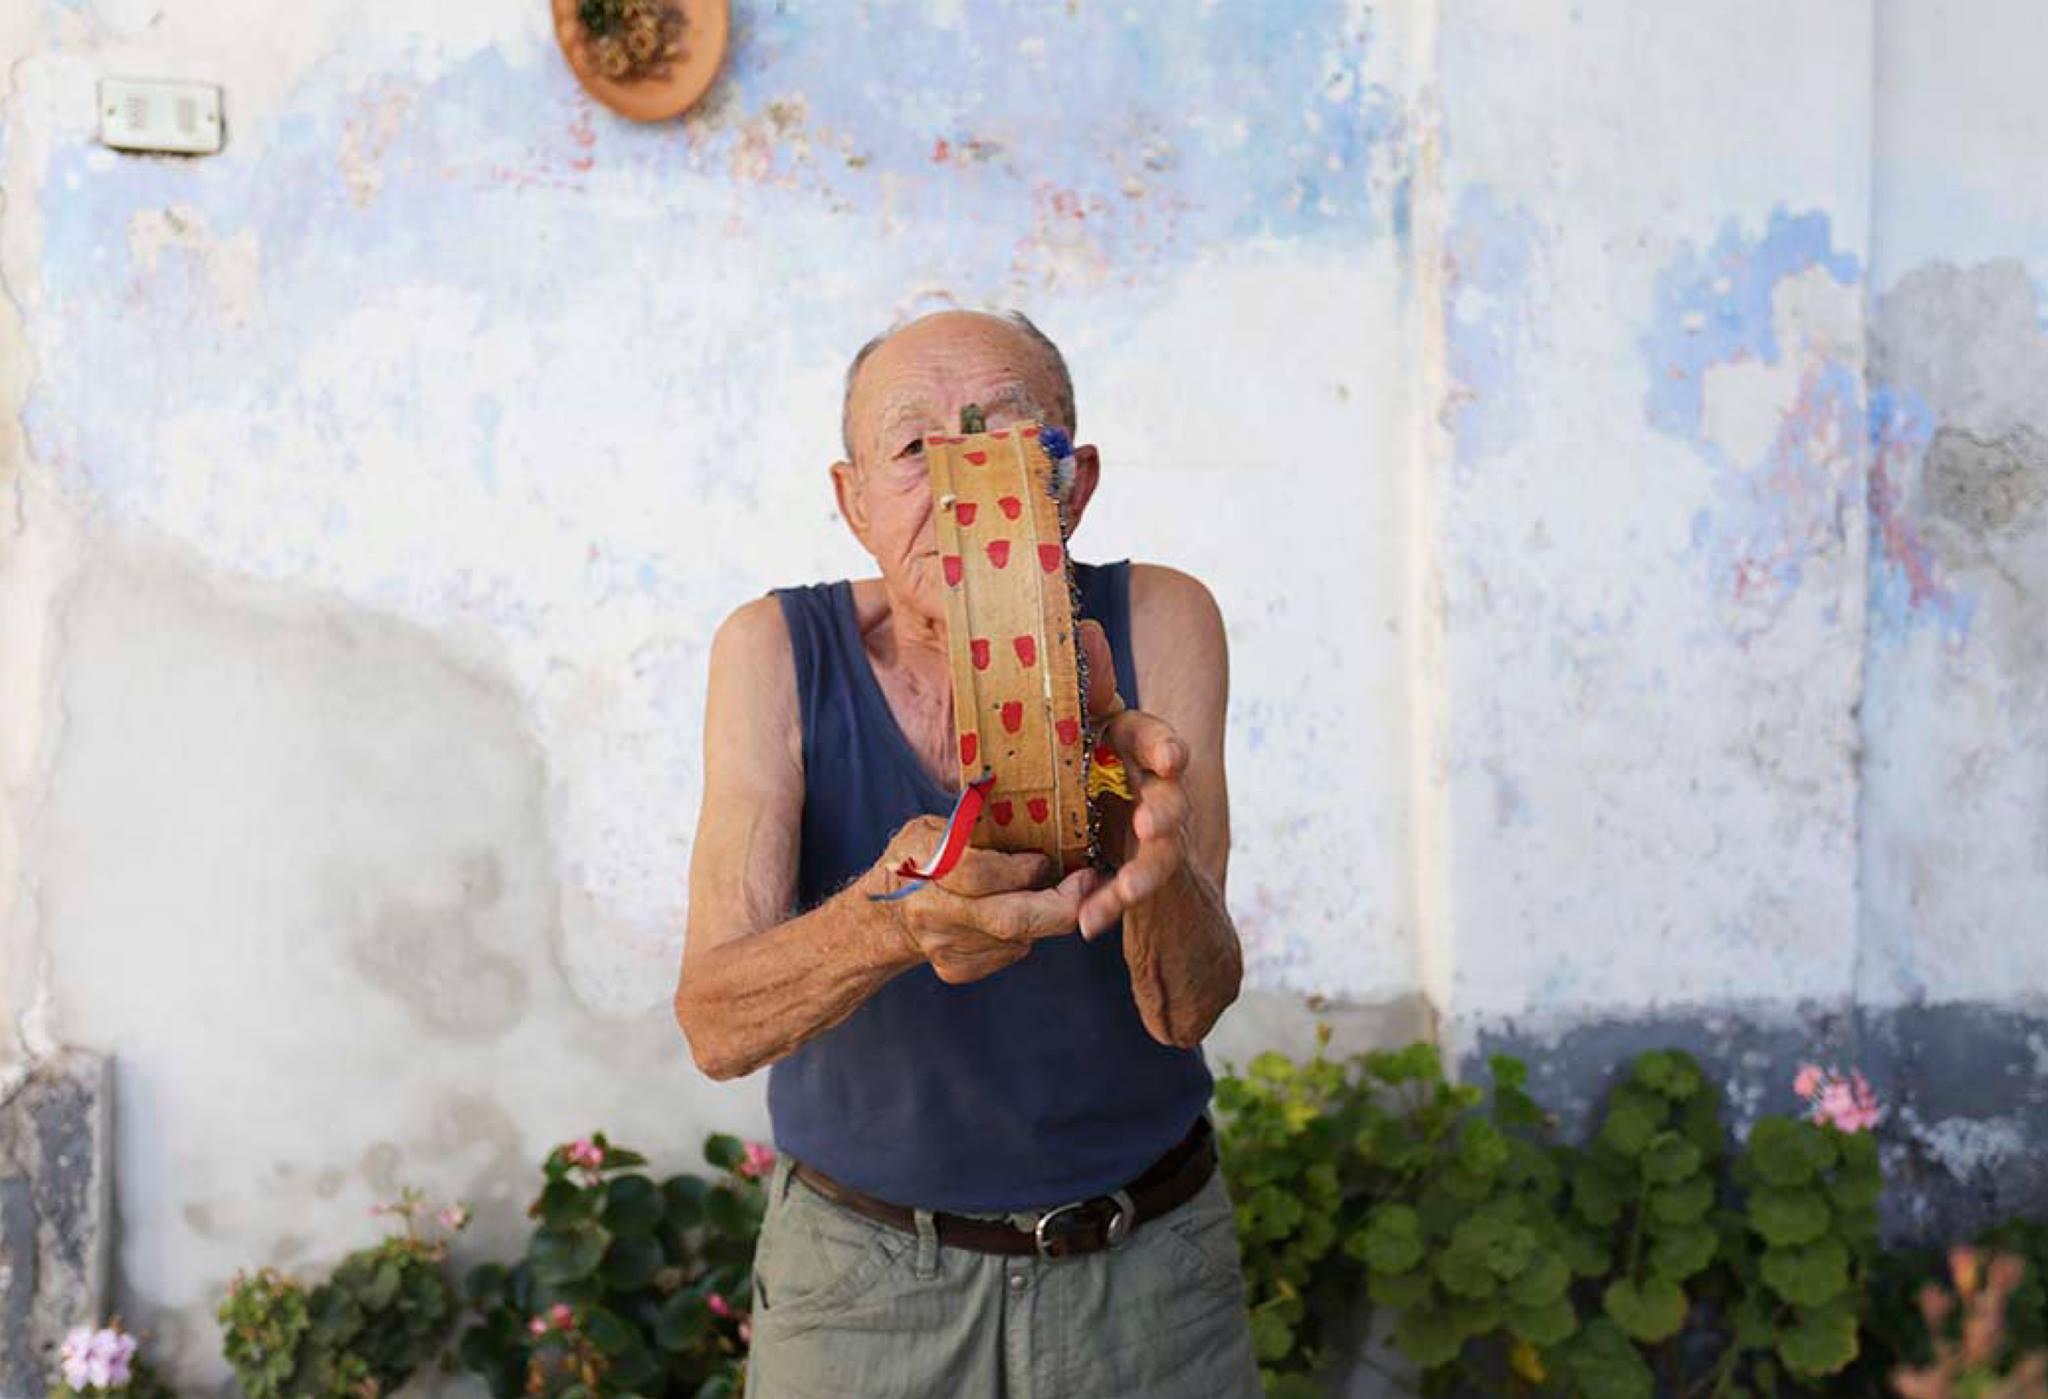 Exposition photographique de Marianna Capuano